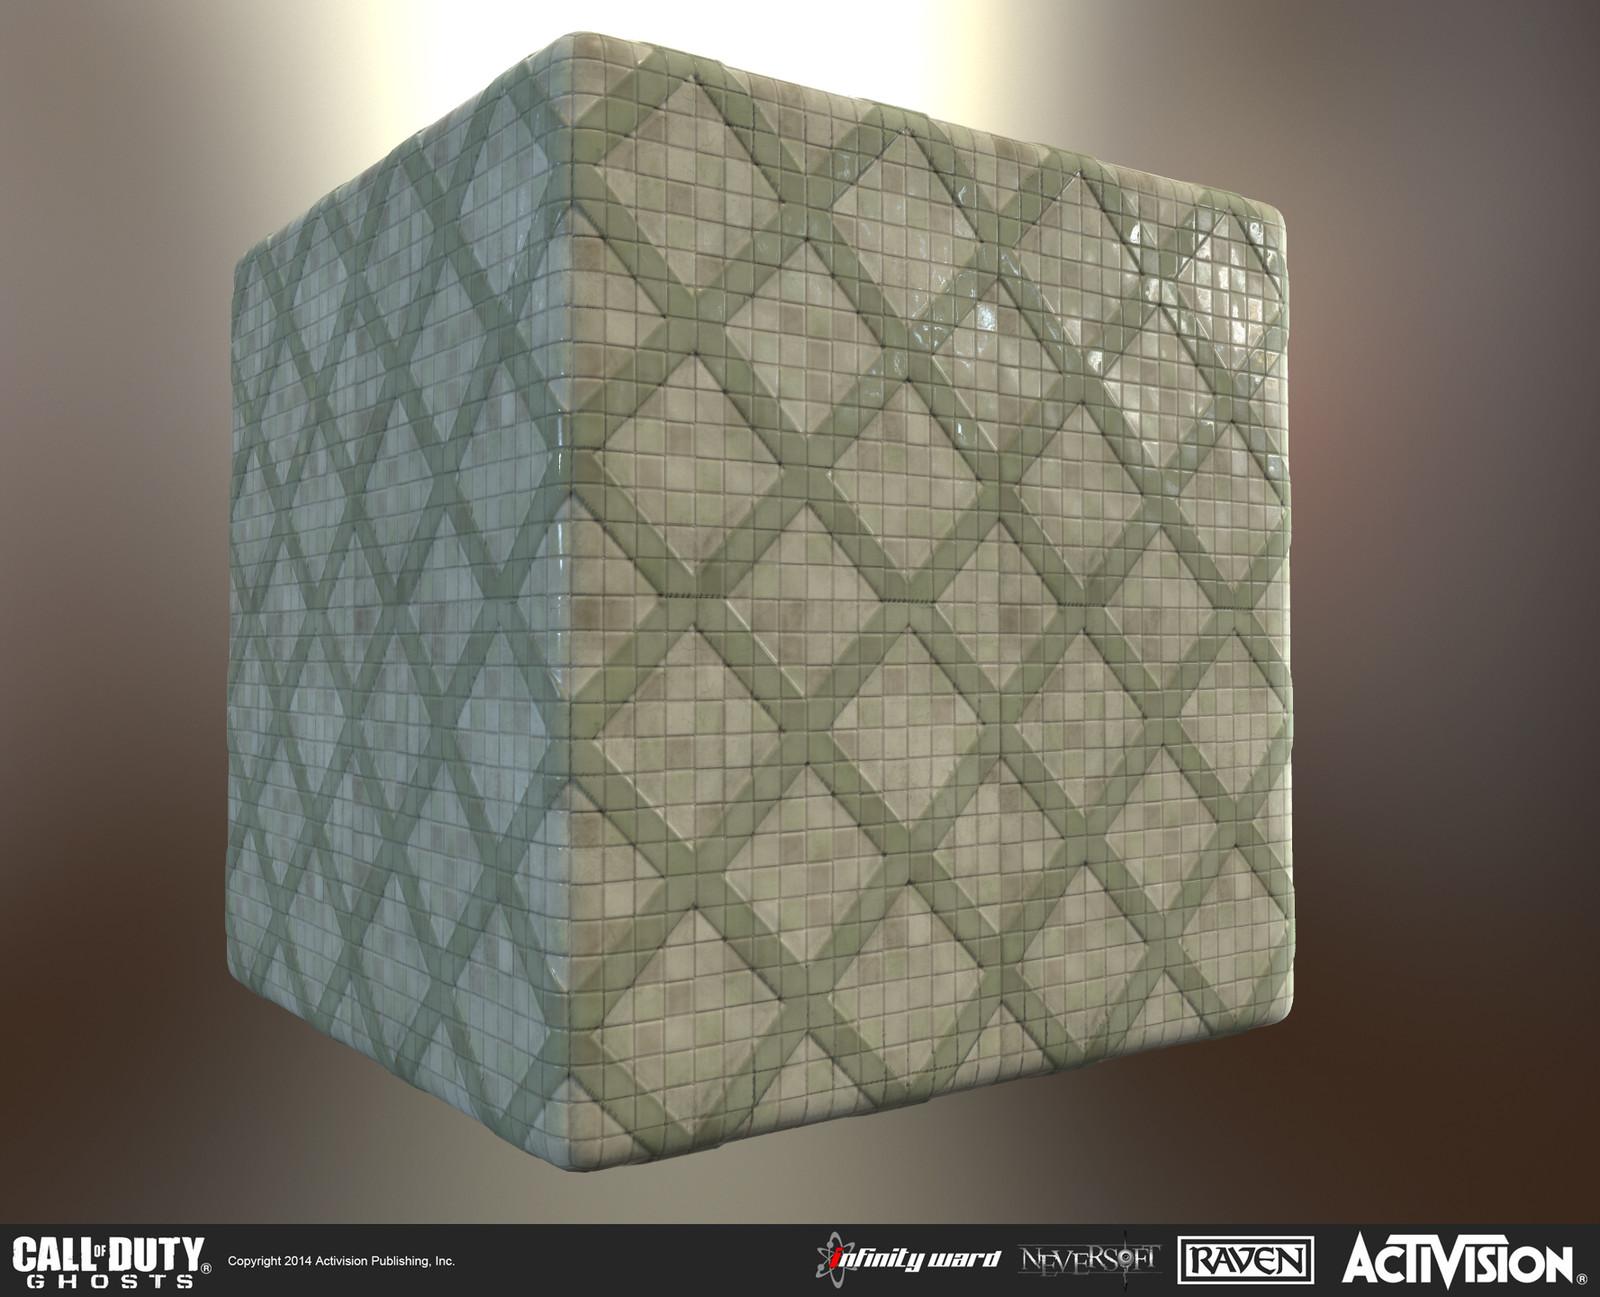 Tiling tile material.